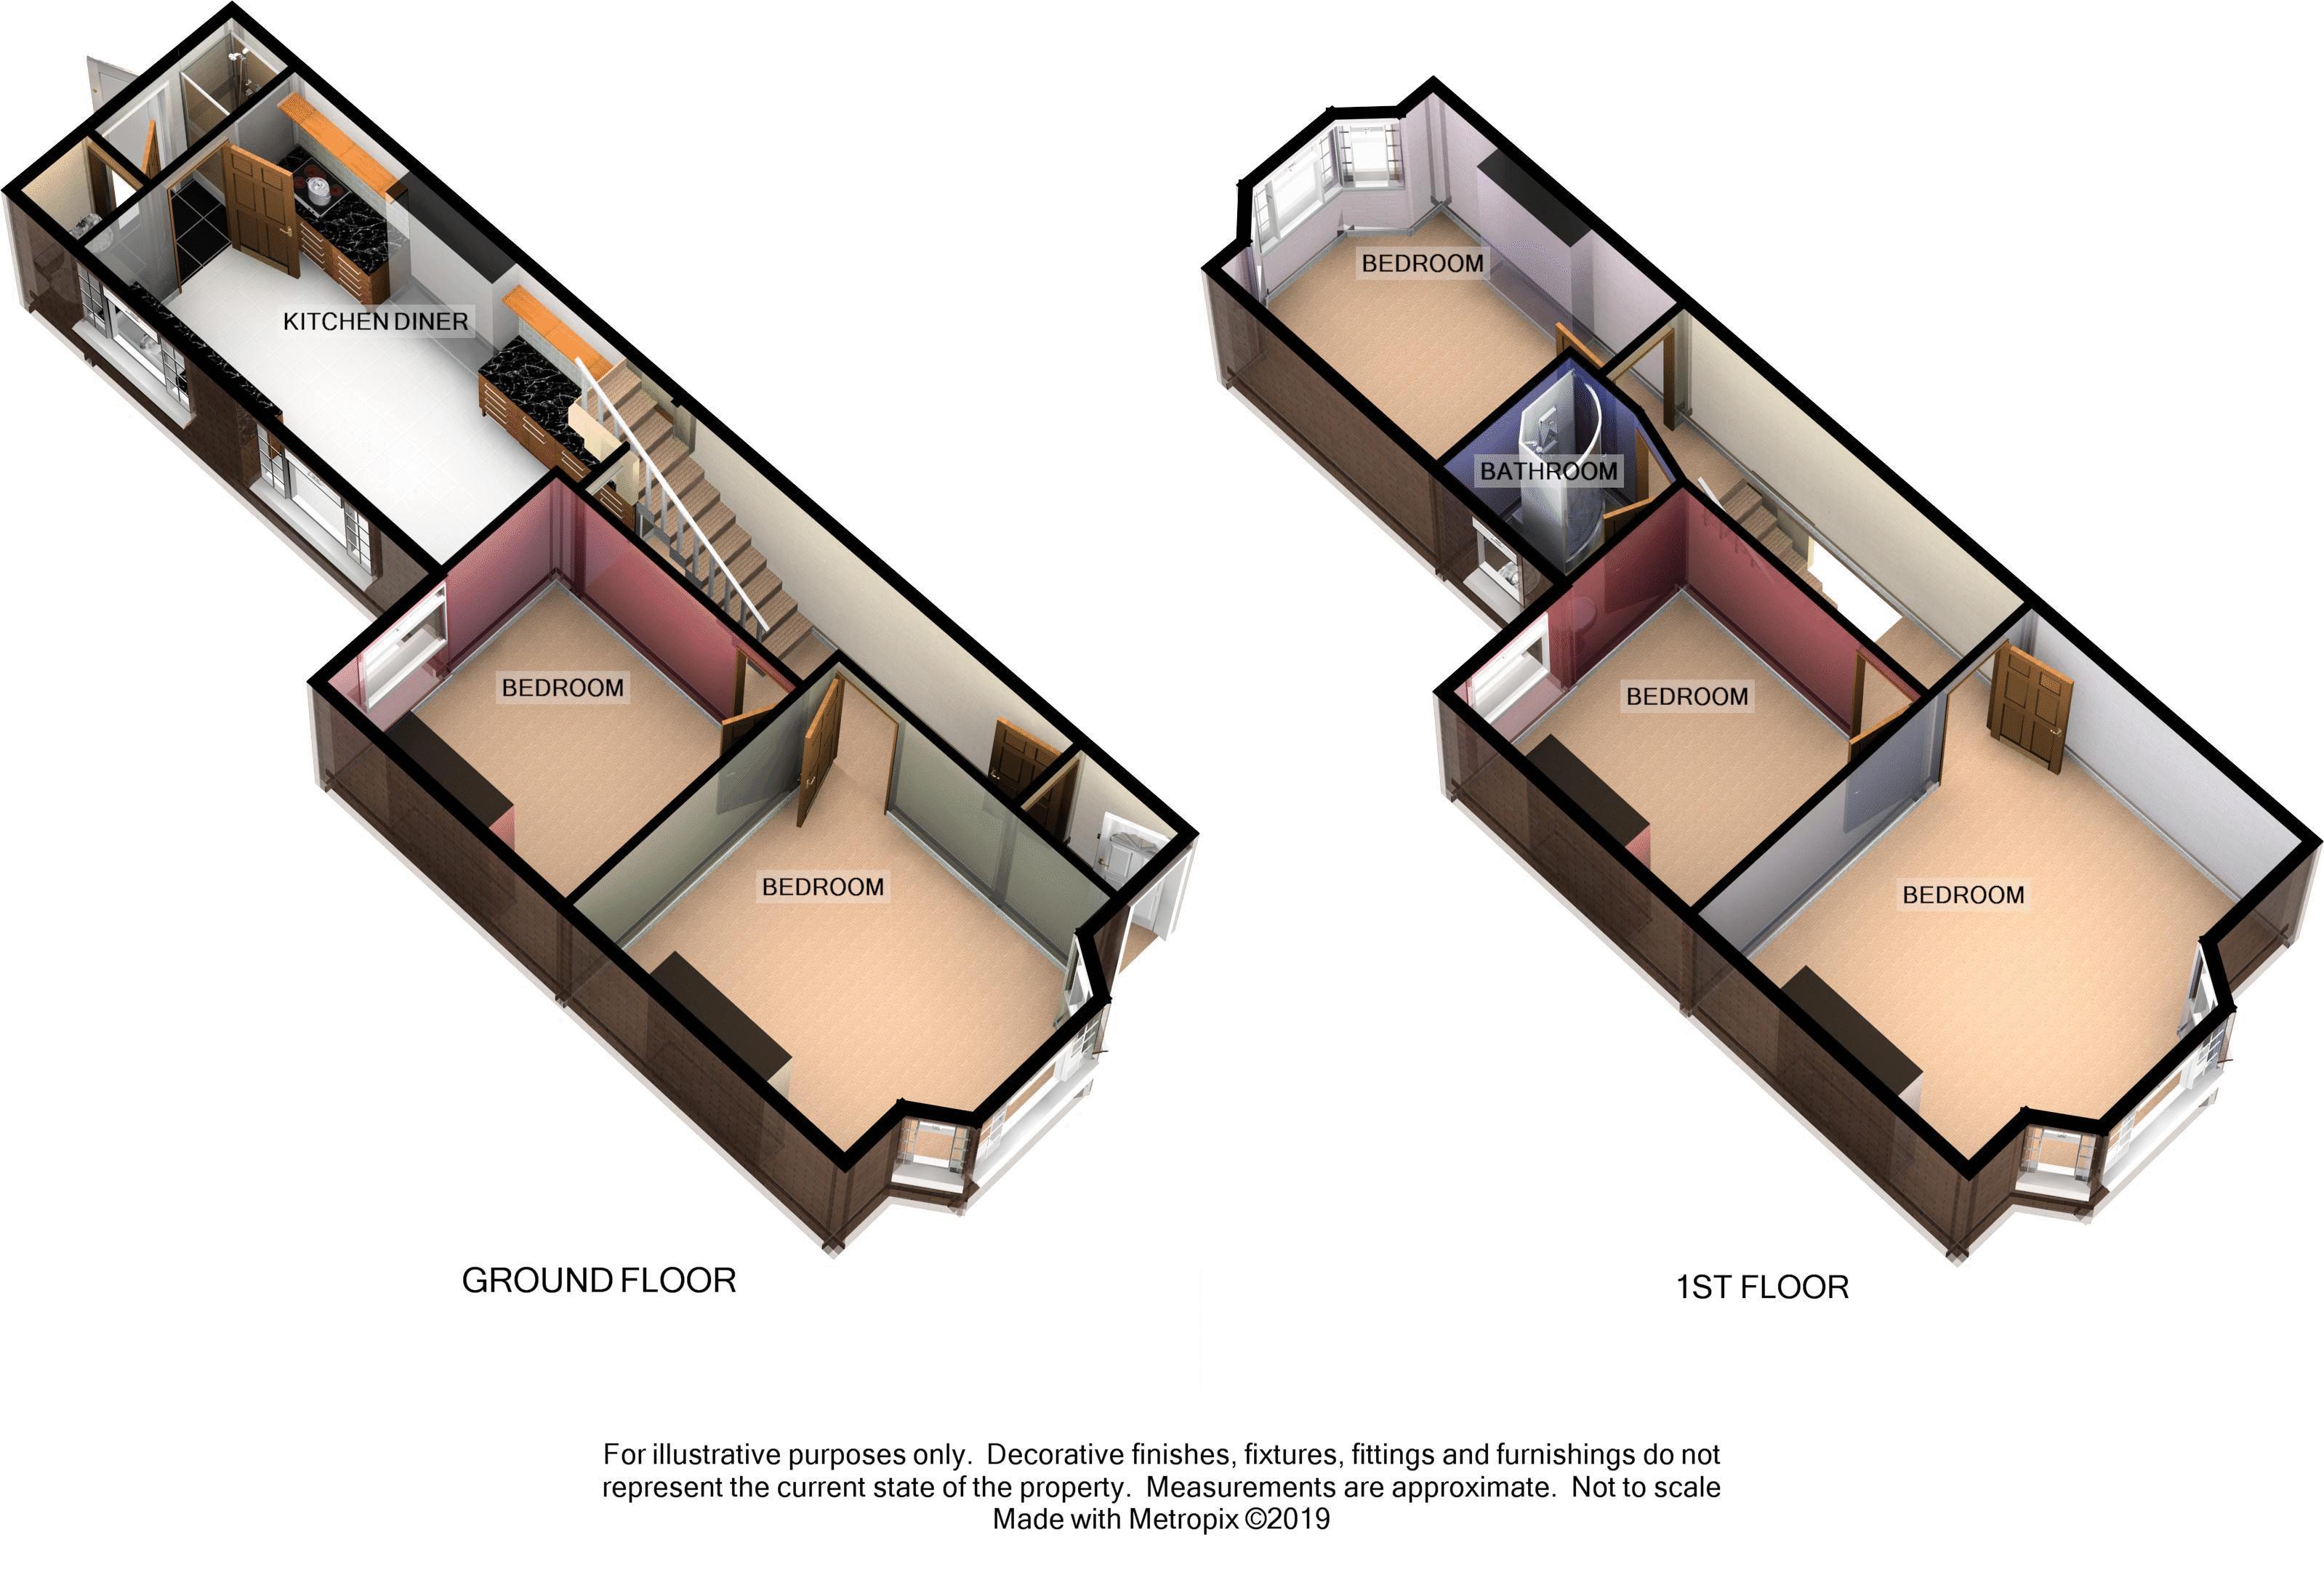 Monks Road, Exeter floorplan